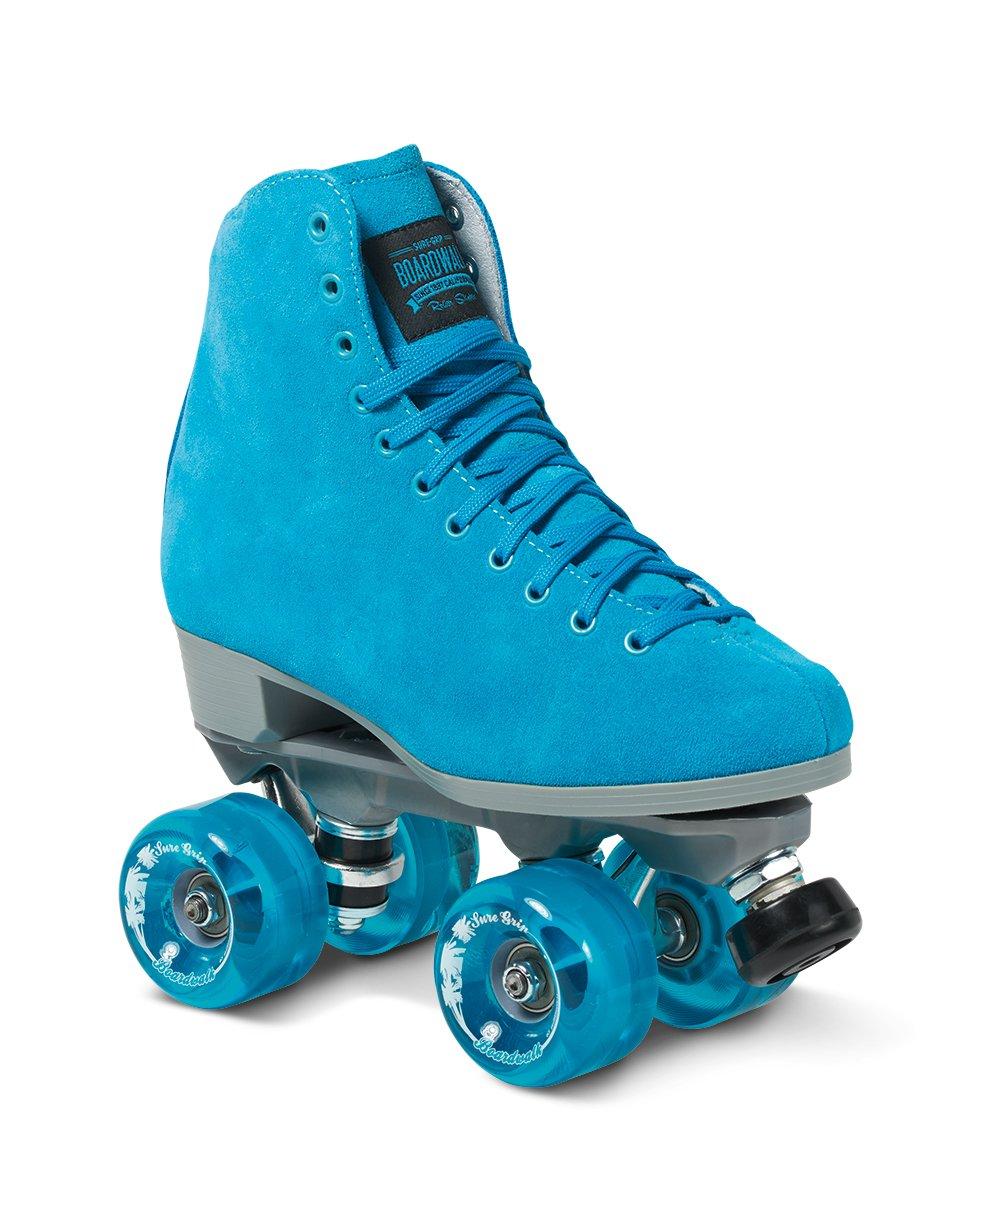 Roller skates blue - Amazon Com Sure Grip Blue Boardwalk Skates Outdoor Sports Outdoors